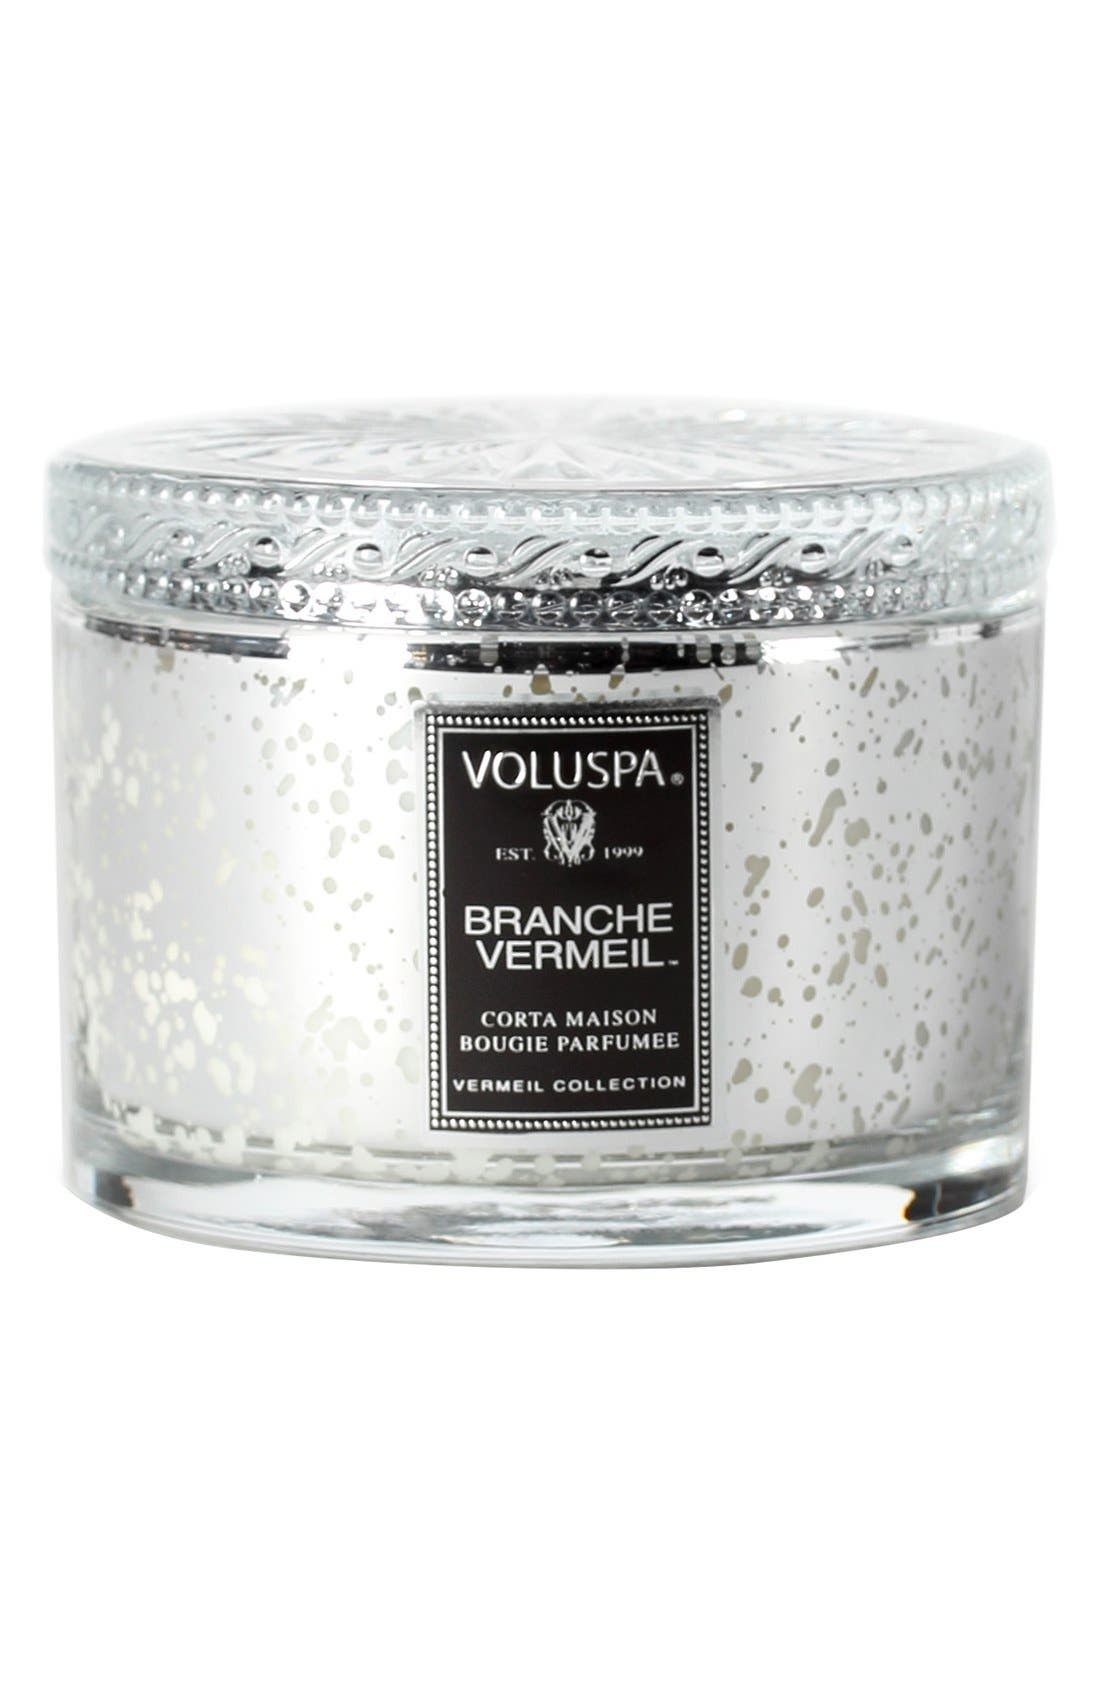 Alternate Image 1 Selected - Voluspa 'Vermeil - Branche Vermeil' Candle